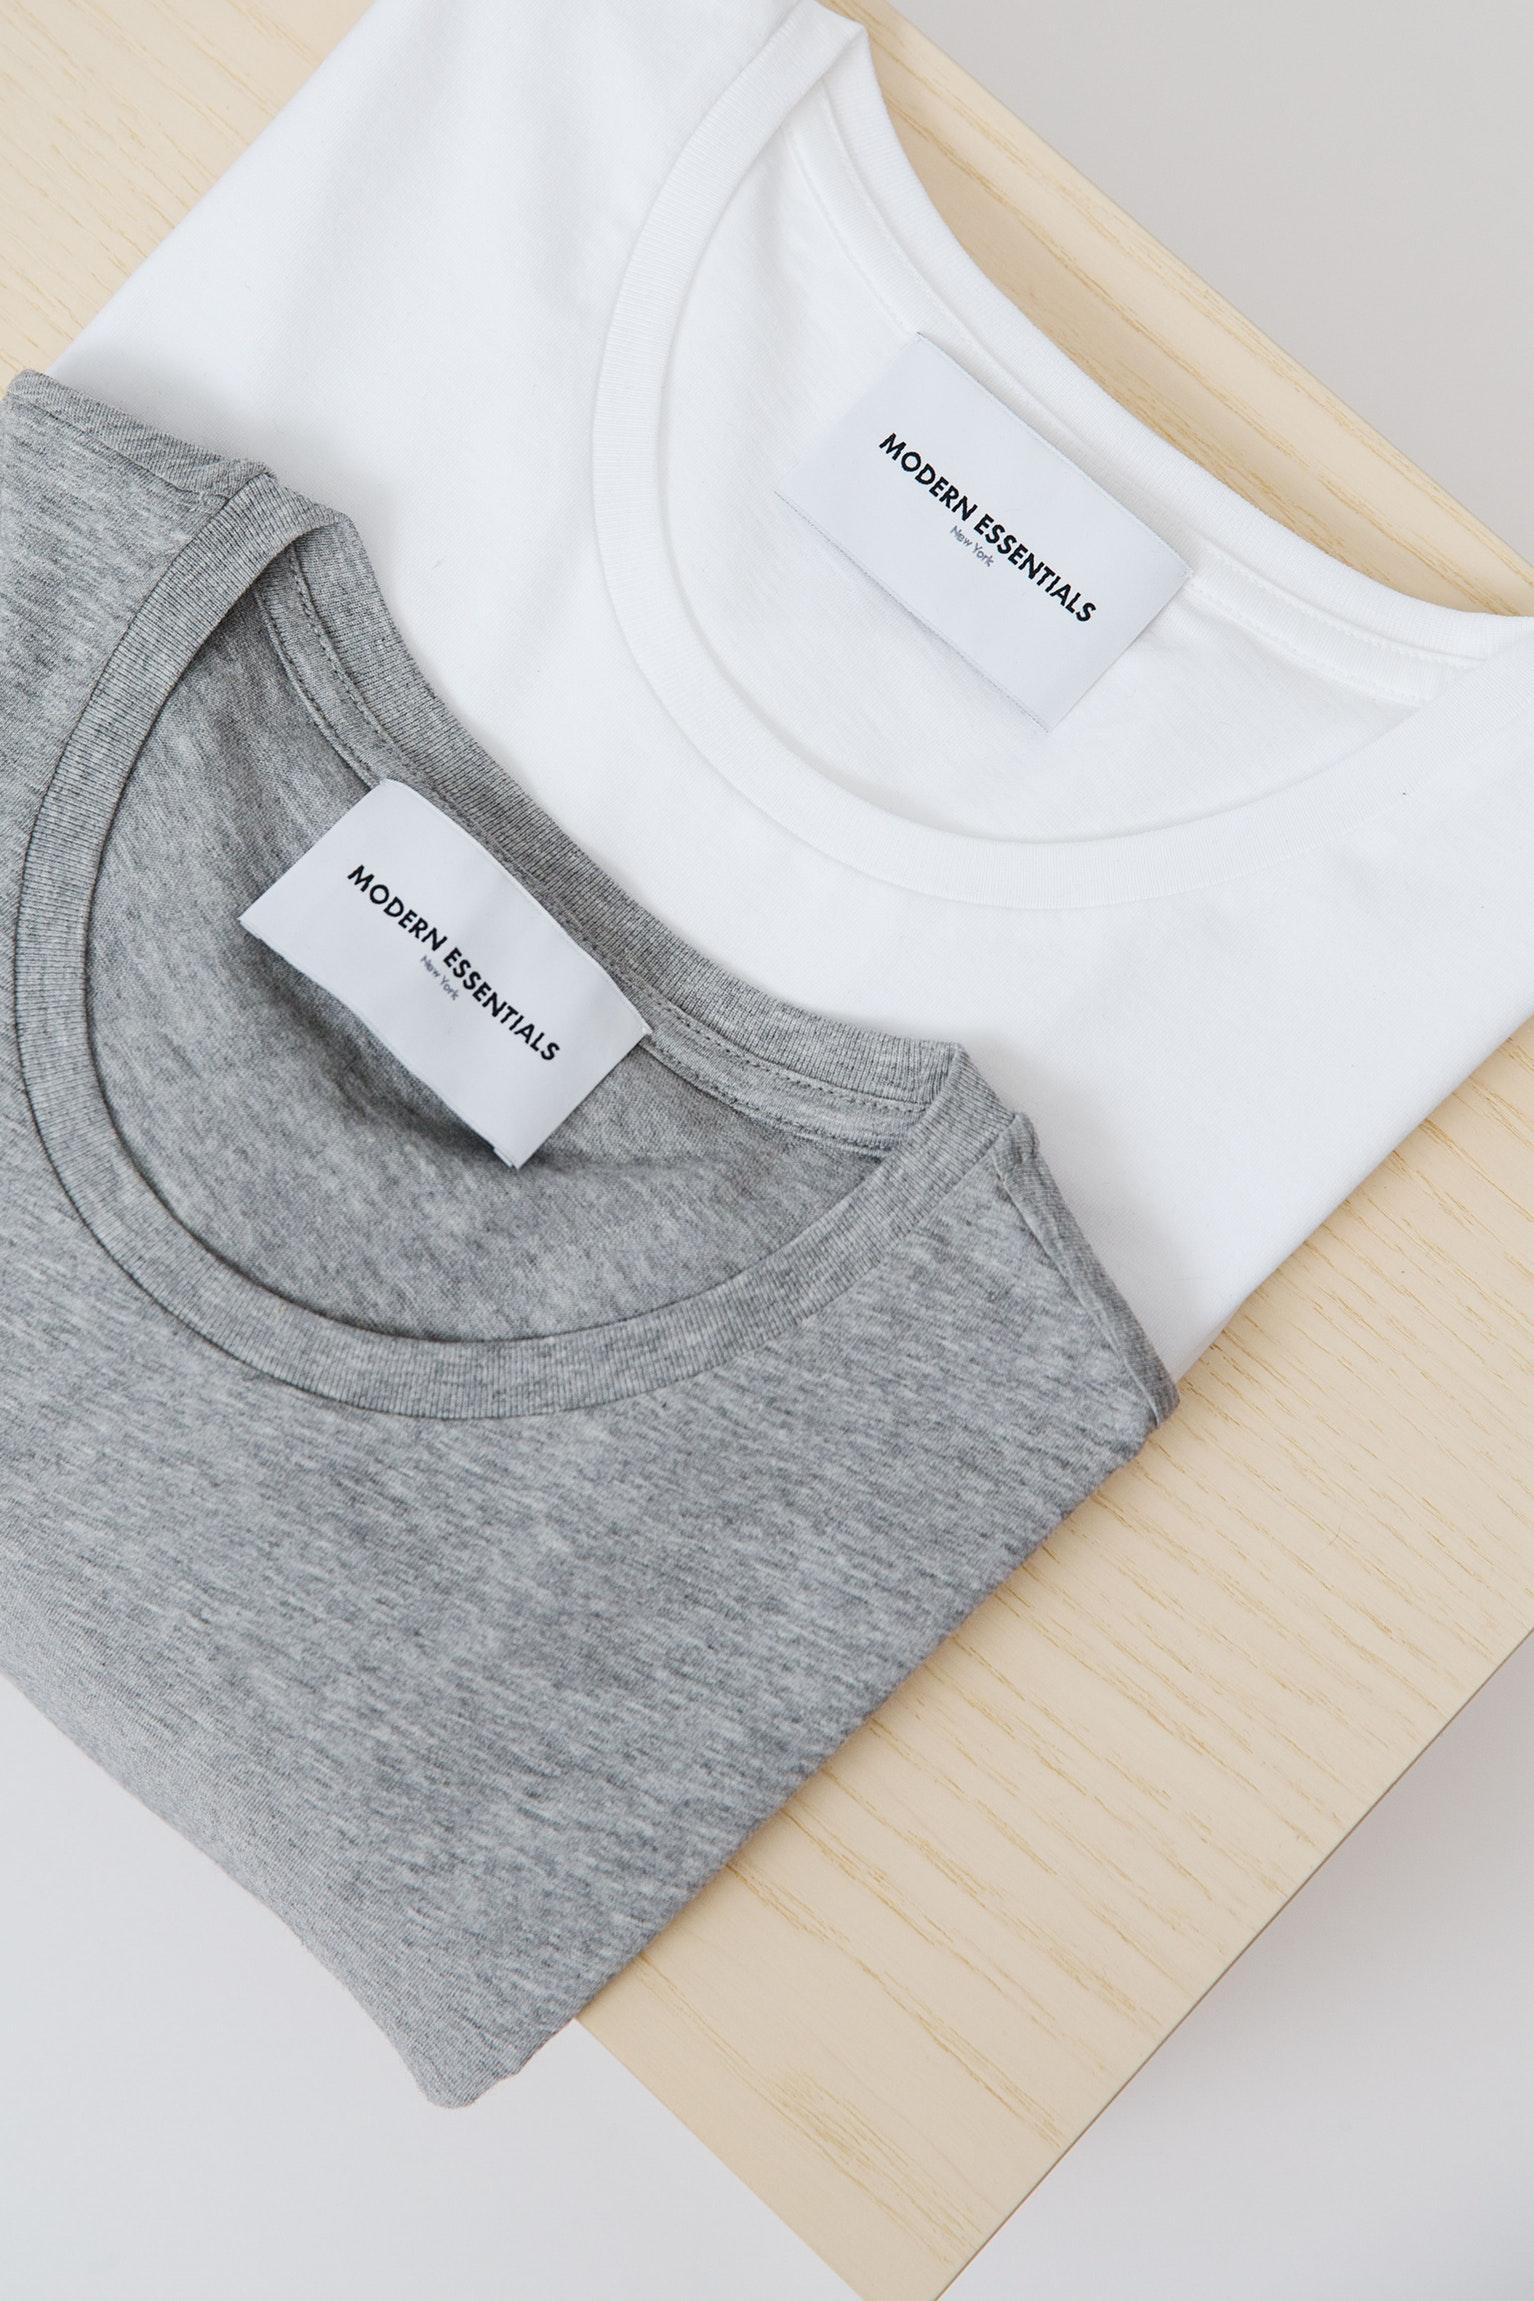 3 Use this Shirts Folding Technique via simphome